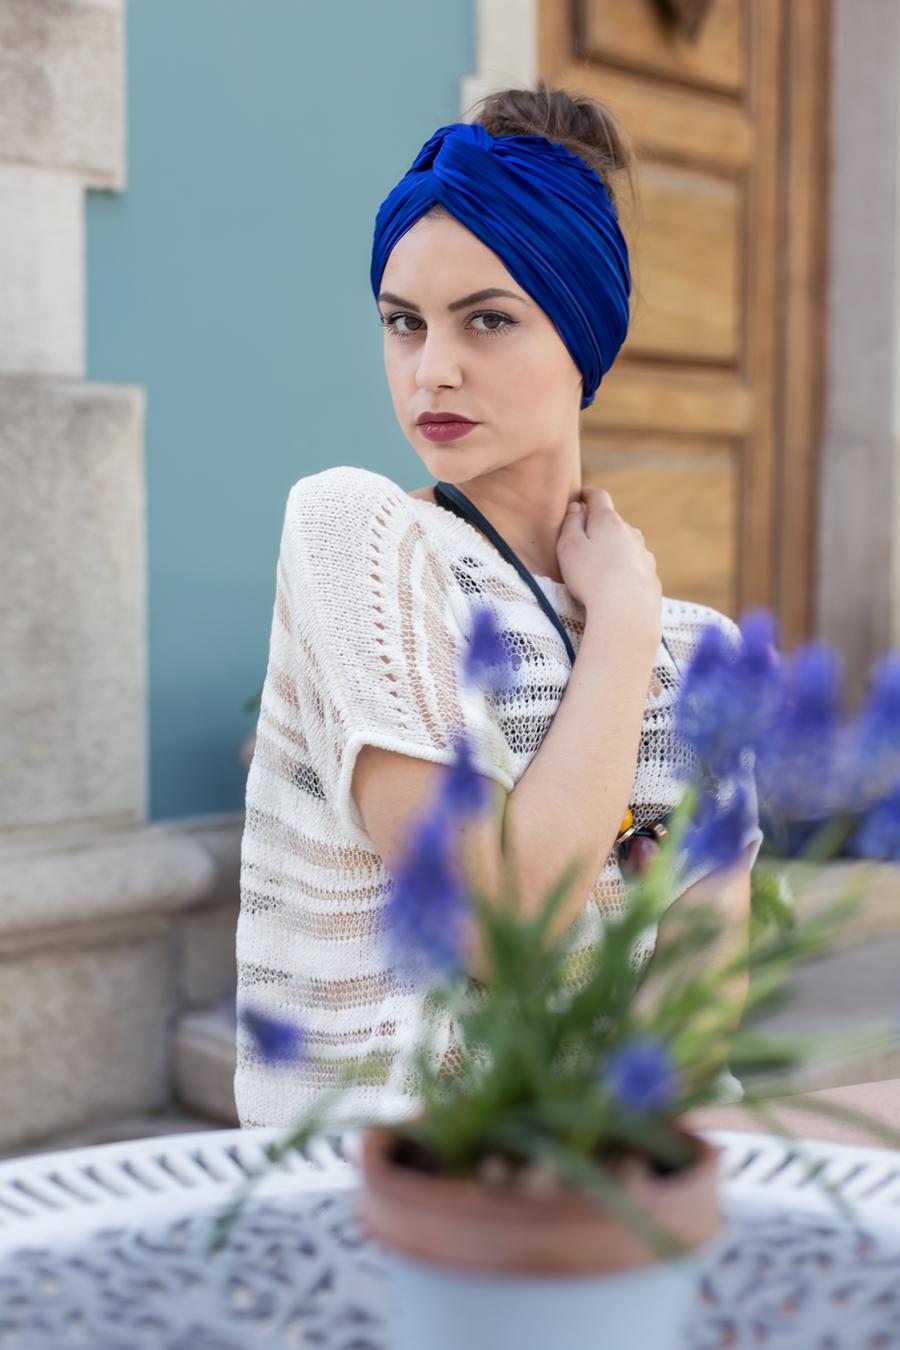 wpid1543-Summer-Fashion-11